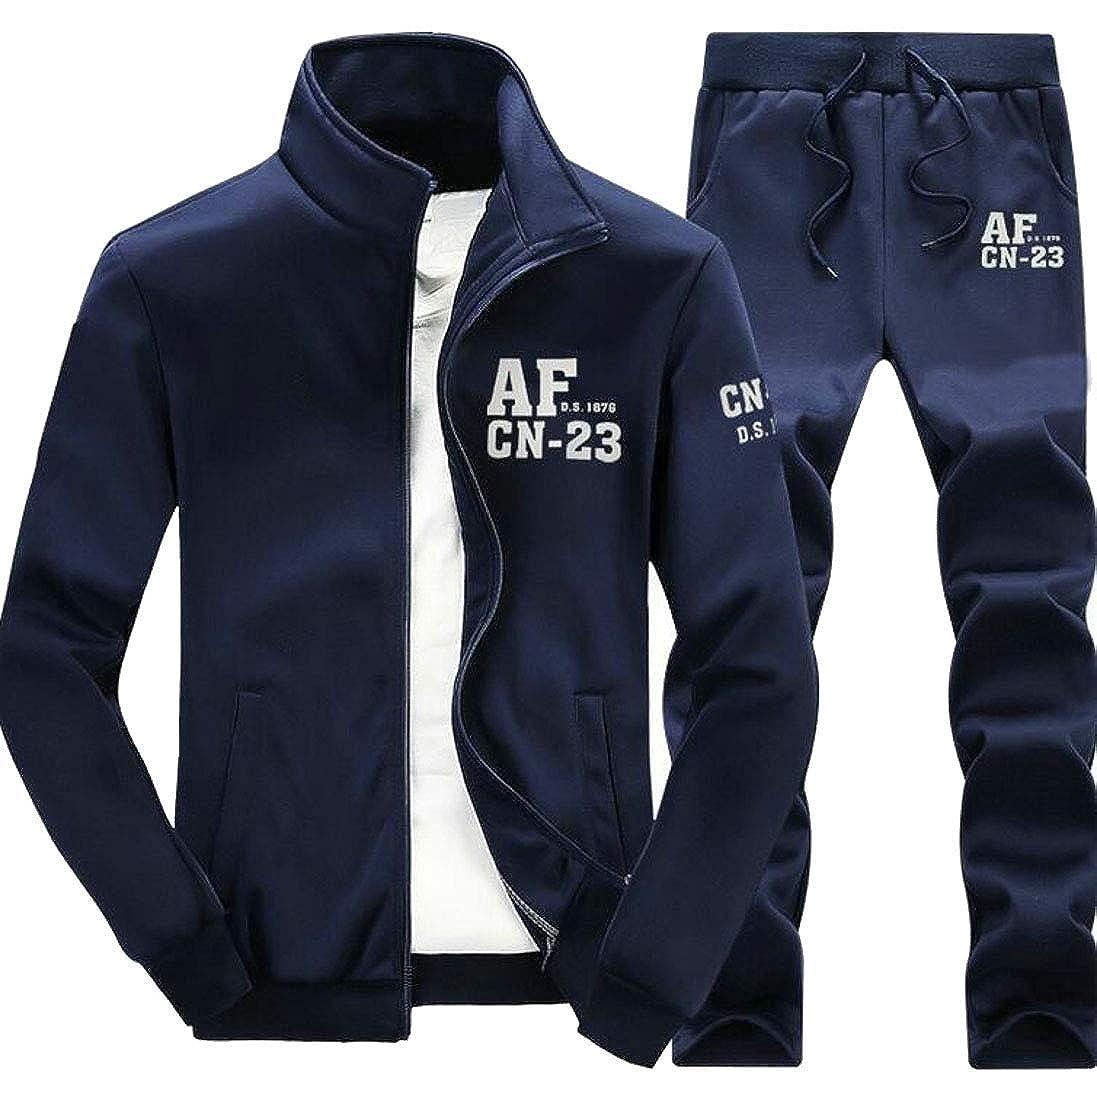 CRYYU Men Casual Sport Jogging Full Zip Sports Jacket /& Pants Tracksuit